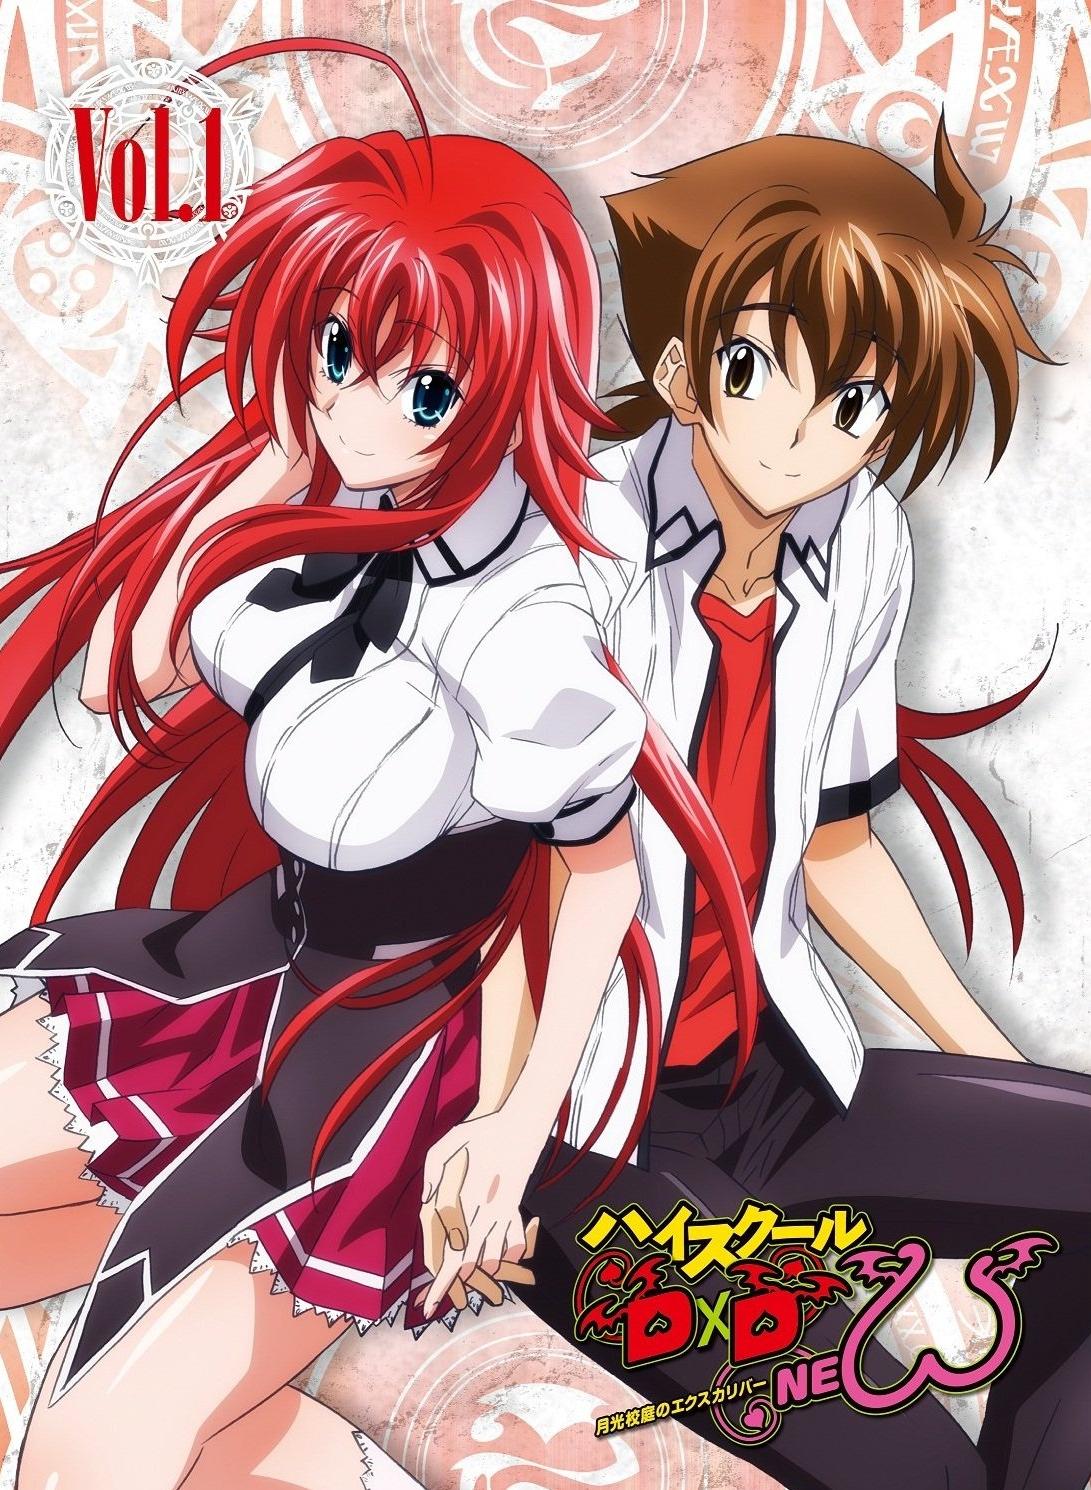 High_School_DxD_New_Vol.1_DVD.jpg